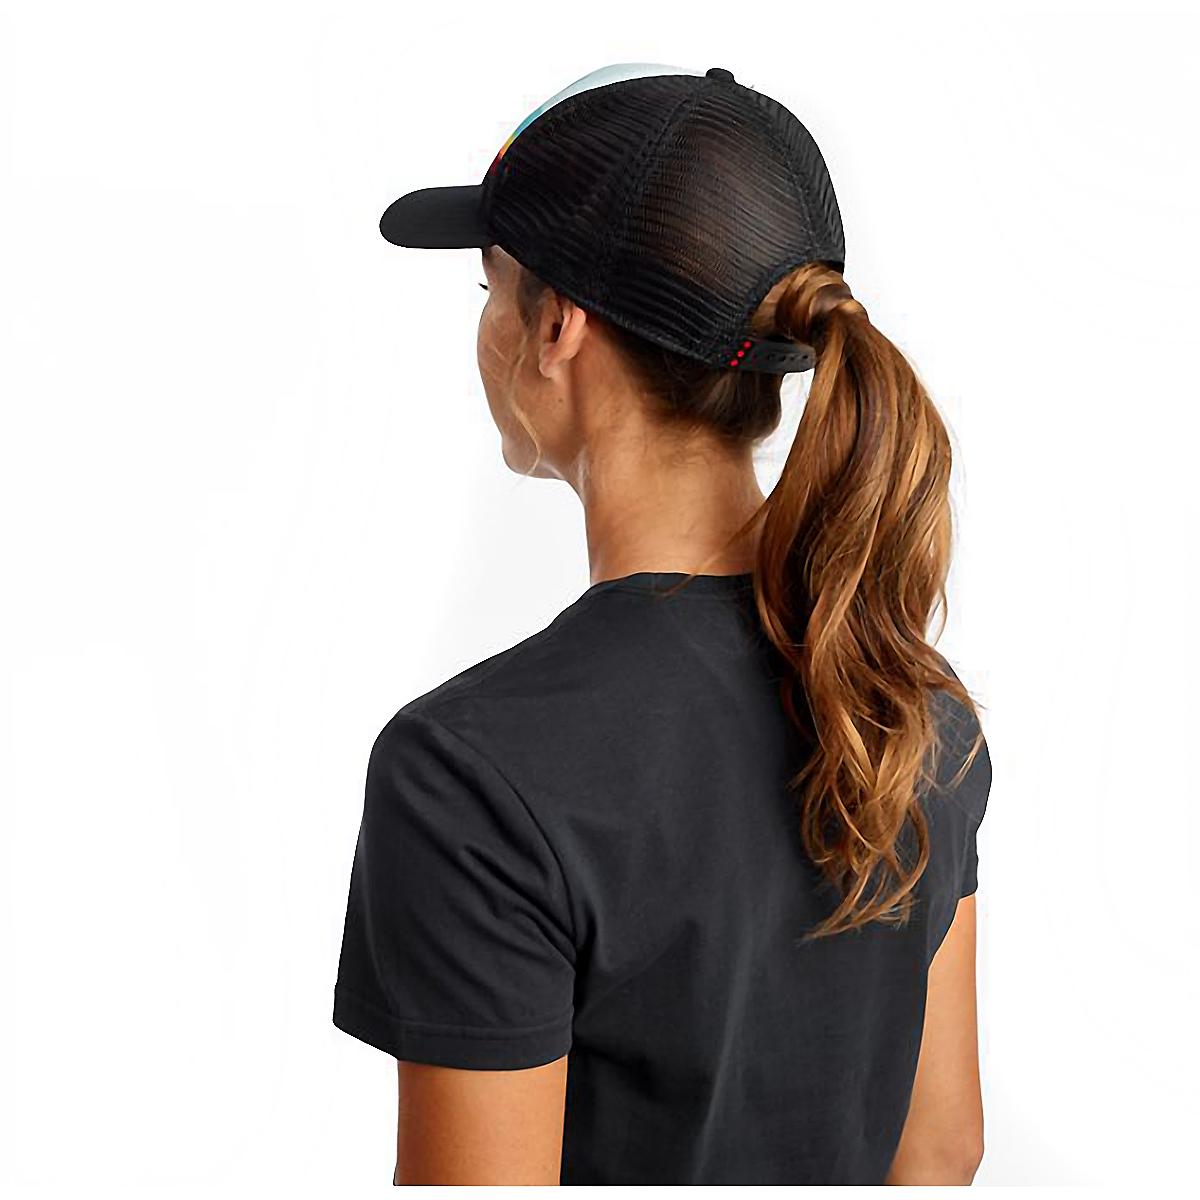 Saucony Foam Trucker Hat - Color: Black, Black, large, image 2